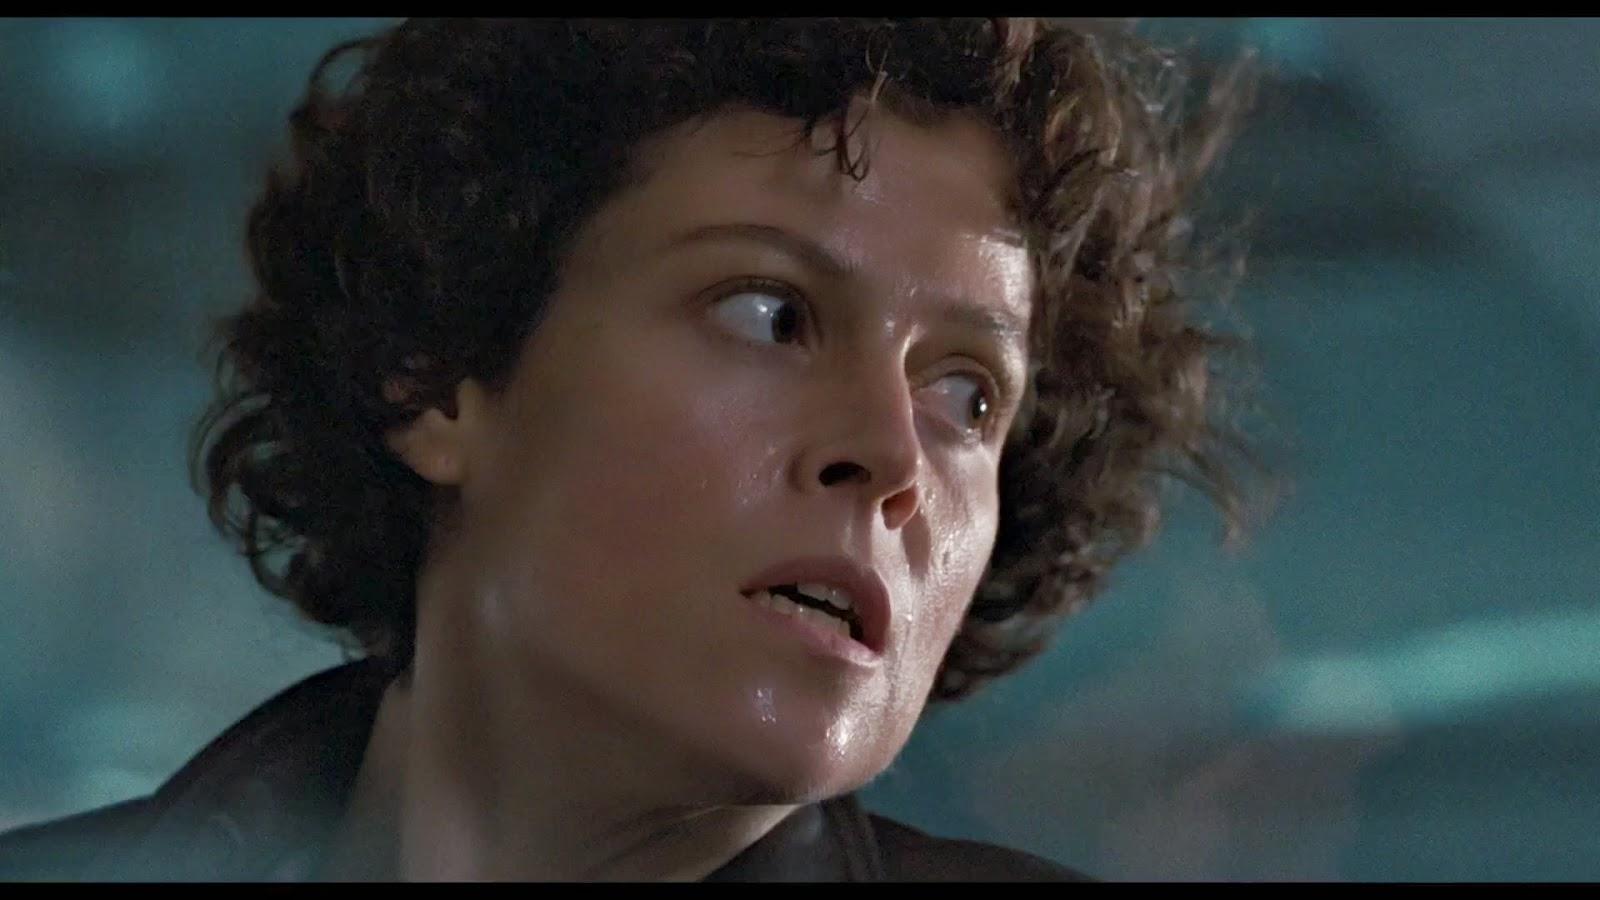 Aliens El Regreso 1986 Full 1080p Hd Mkv Espa Ol Latino  -> Pelismegahd